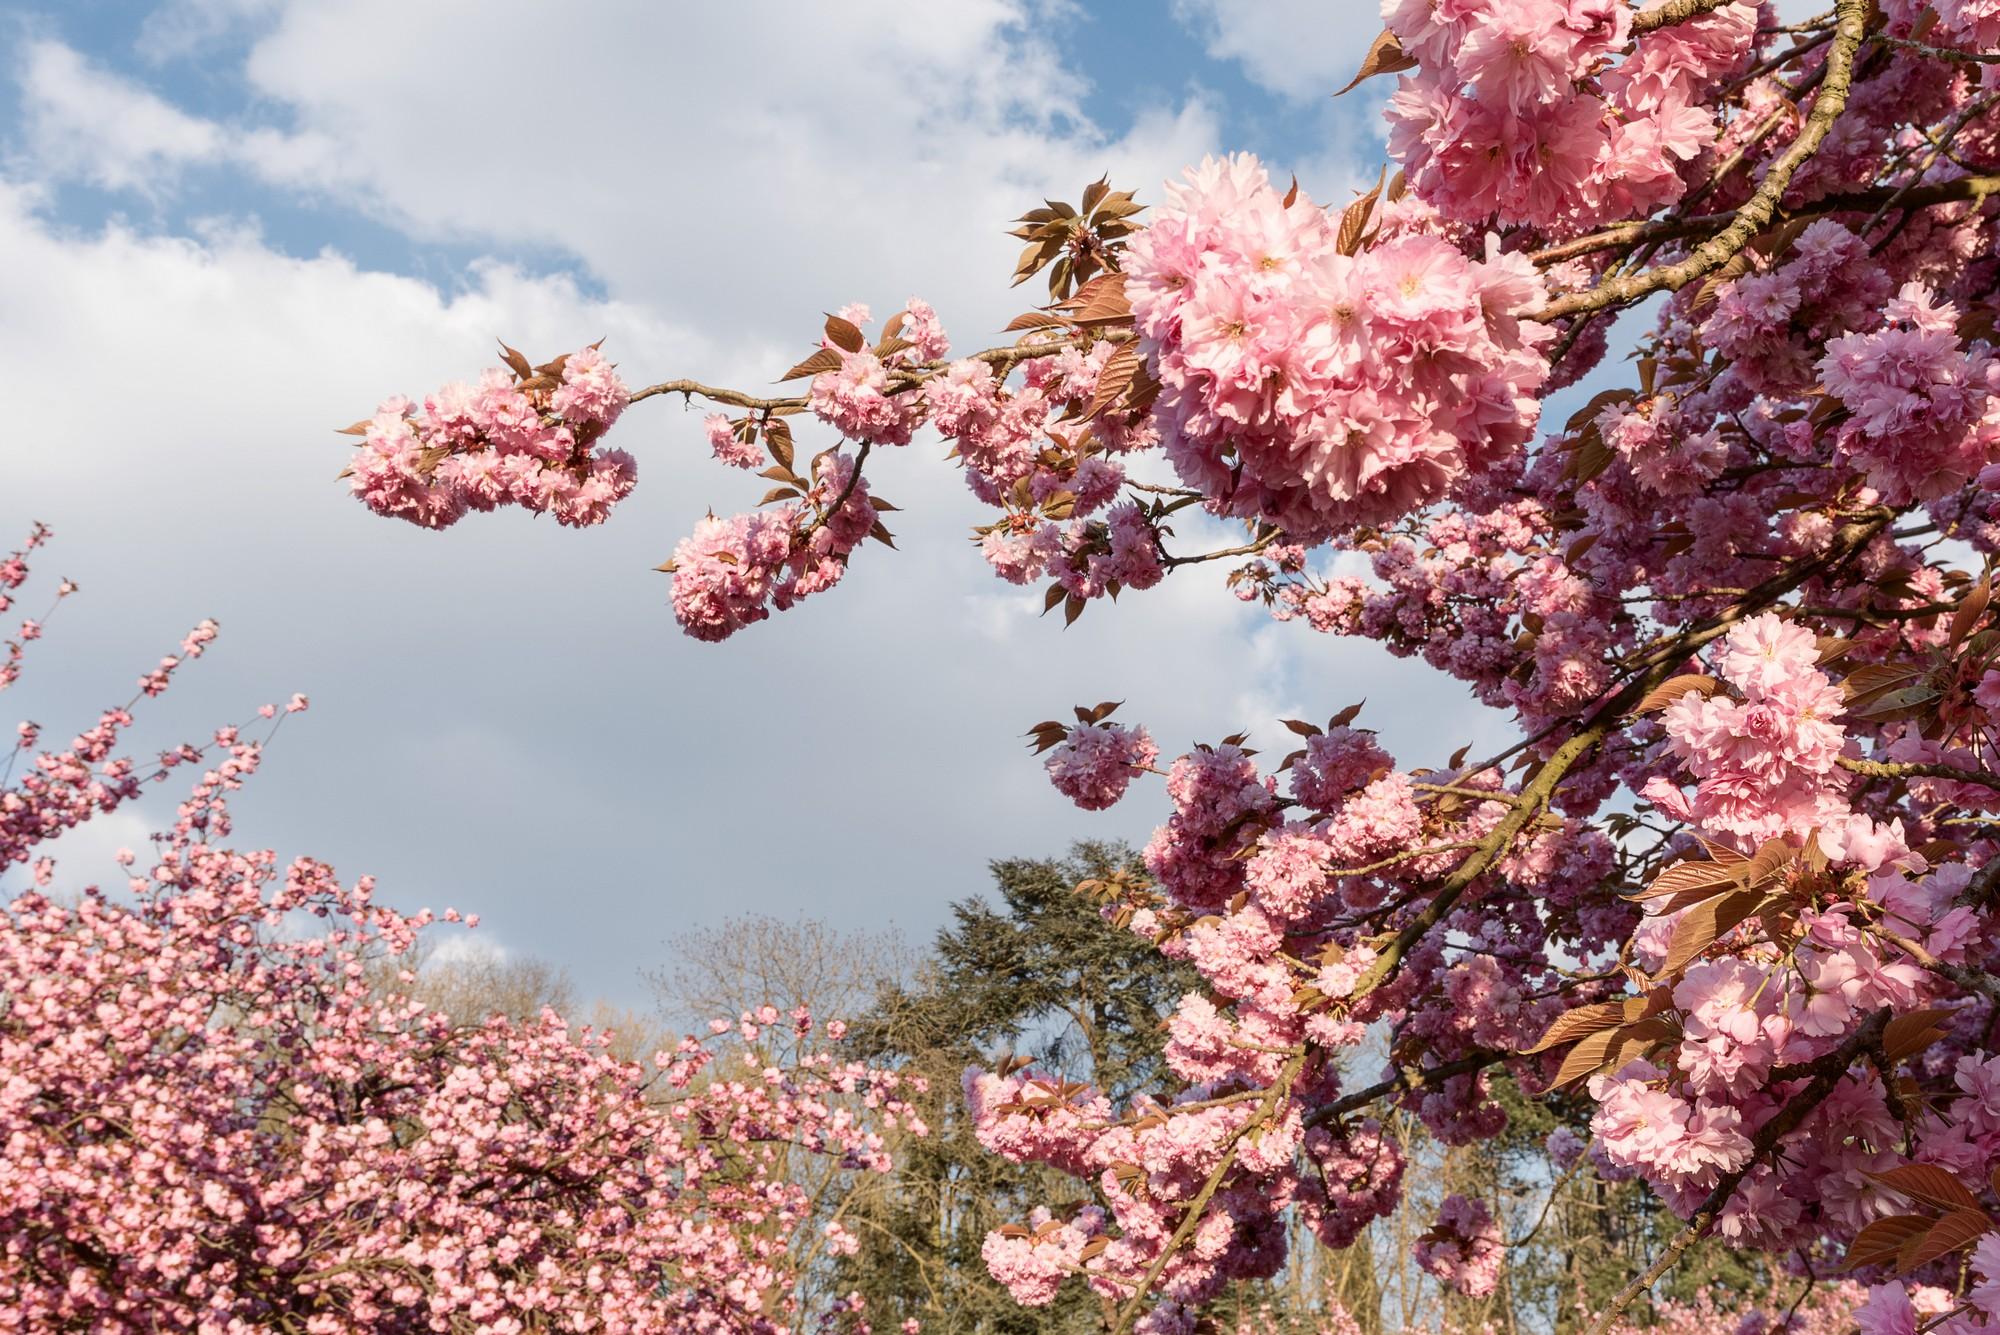 Parc de Sceaux cherry blossom france iledefrance travelling travelphotography travelphoto travelworld cherryblossom spring nature pink parcdesceaux flowers.jpg